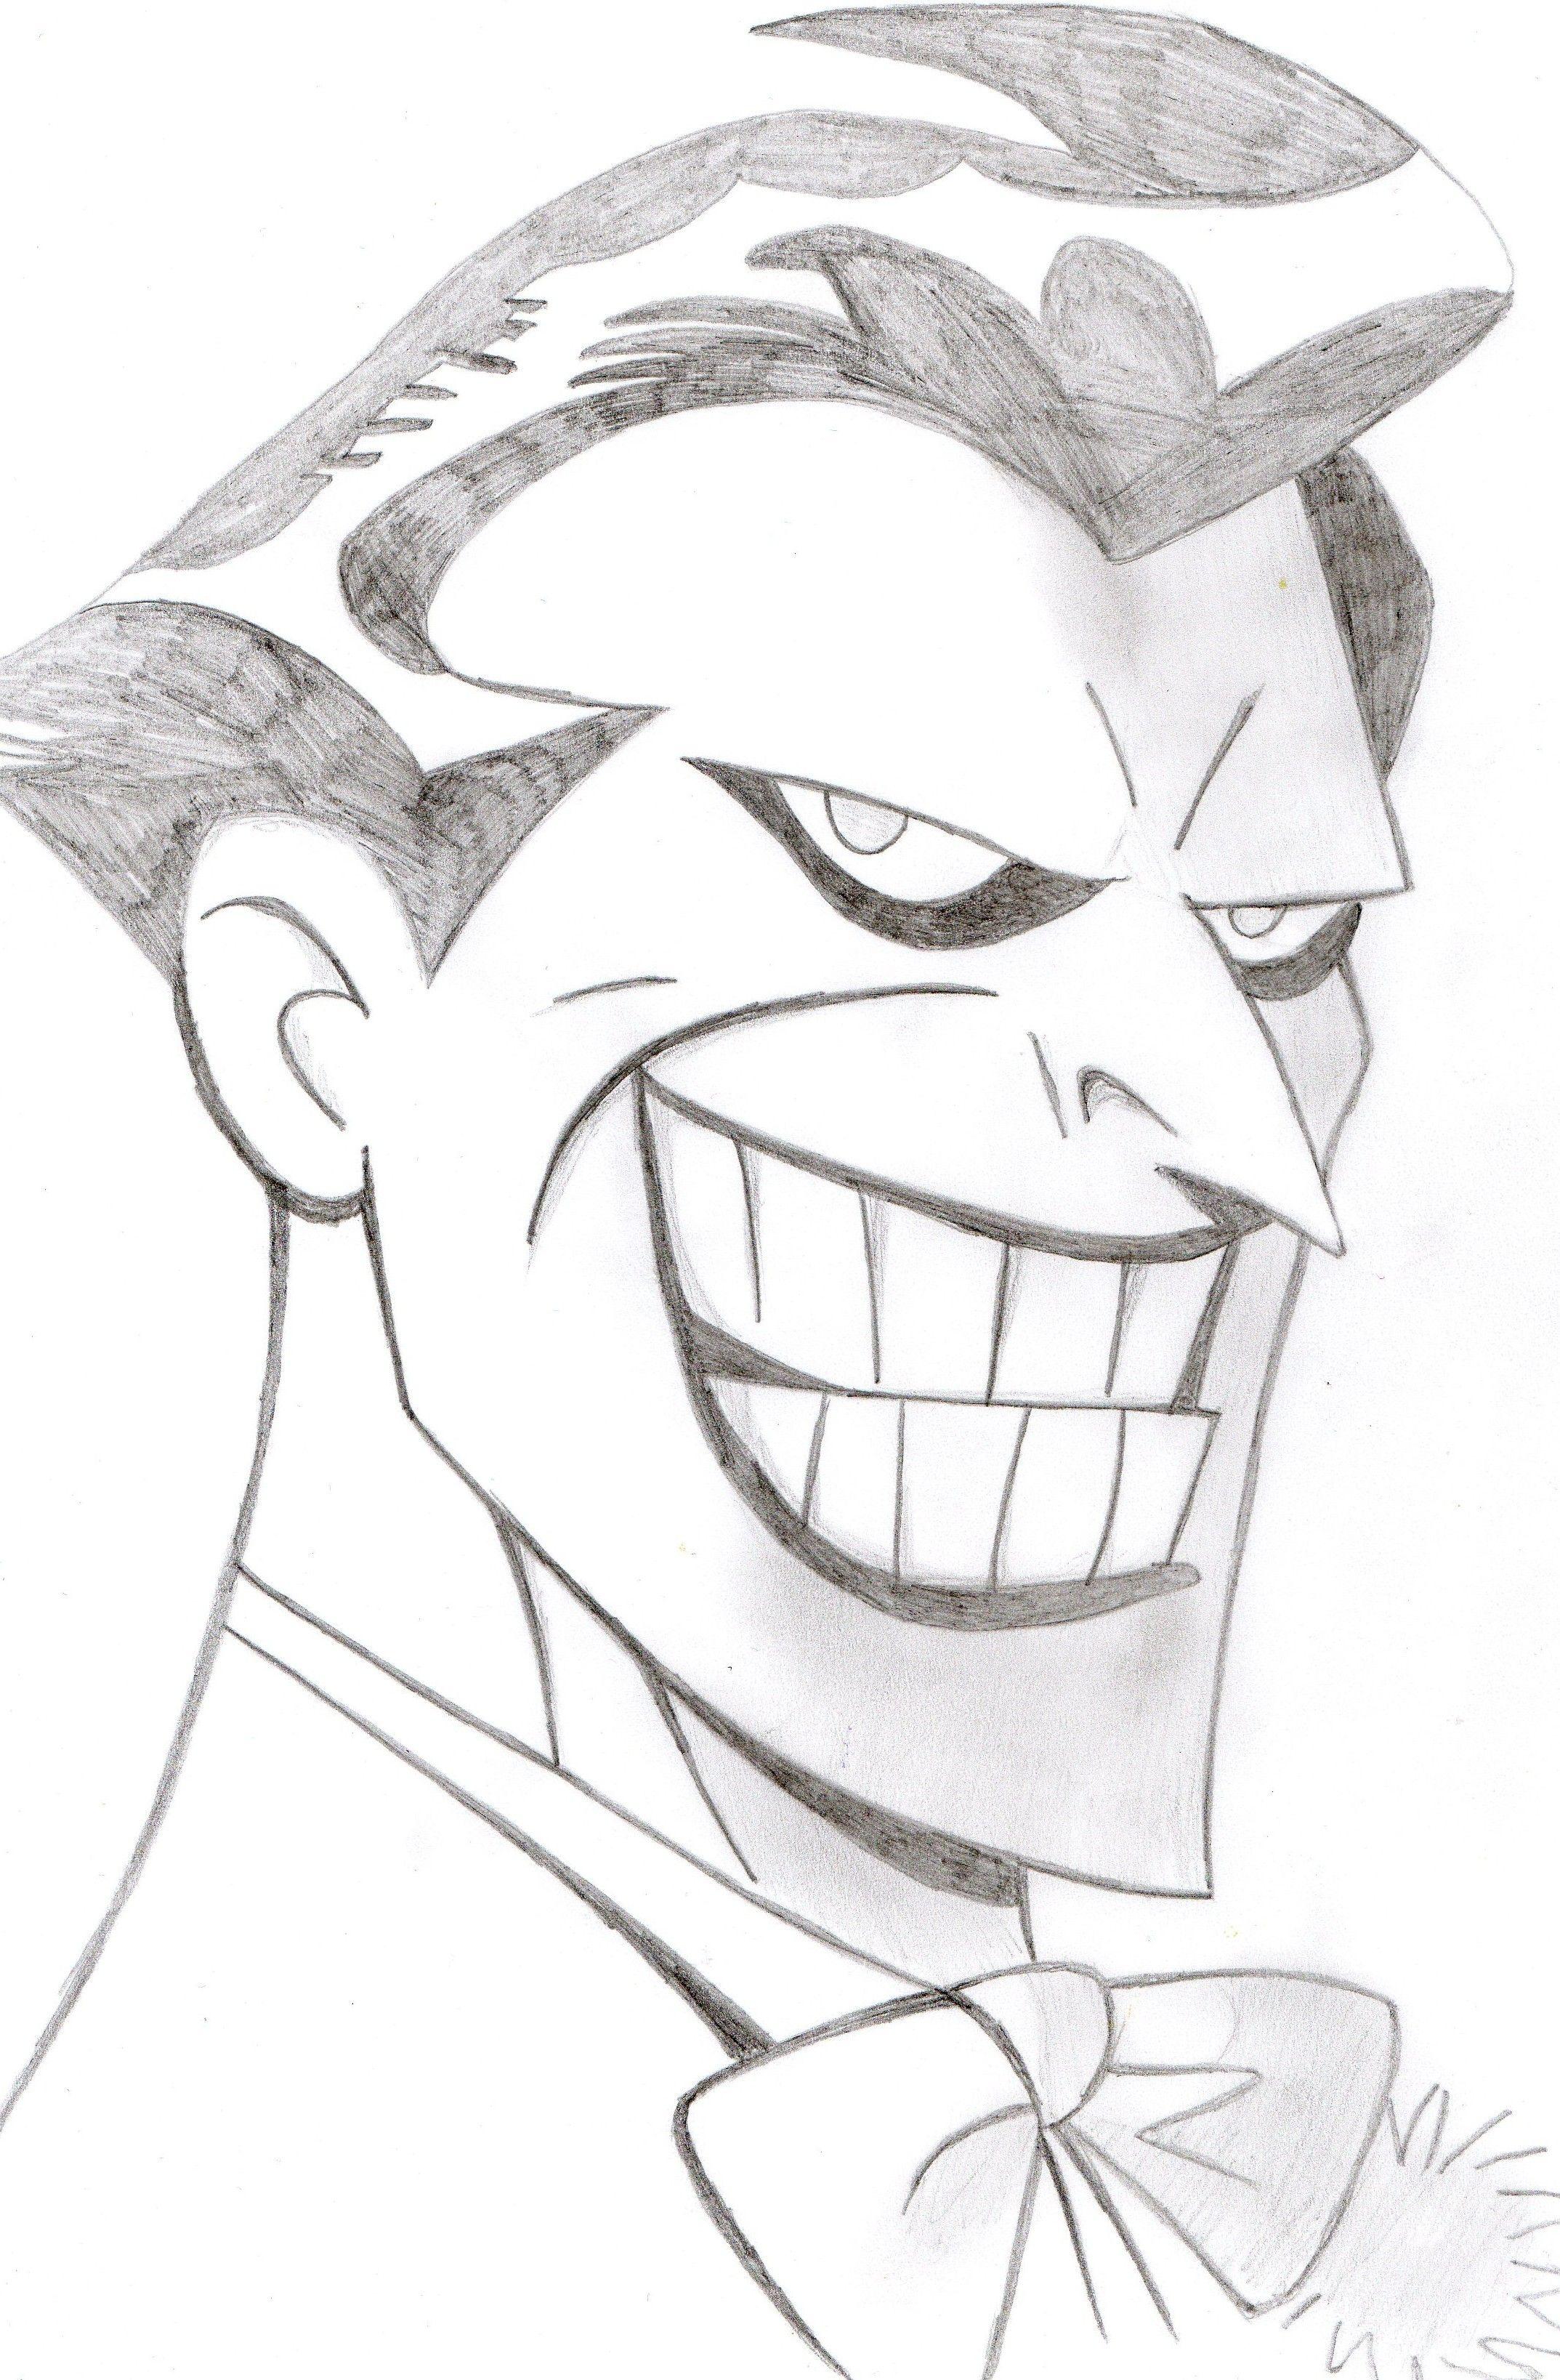 Pin By Vitalclipzyt On Drawings In 2019 Joker Drawings